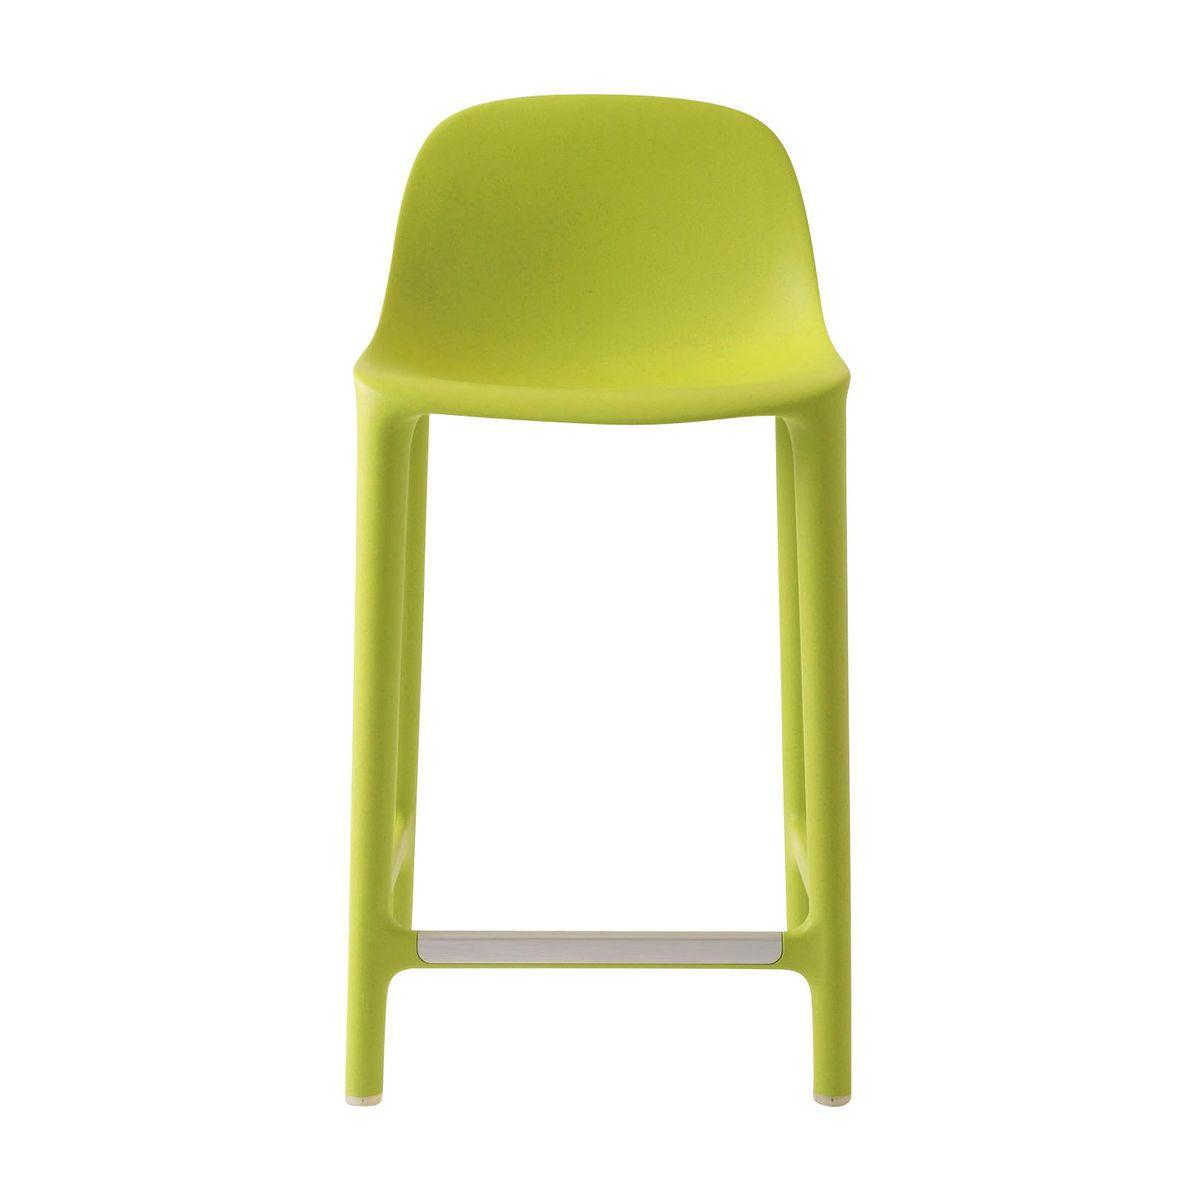 broom stool emeco. Black Bedroom Furniture Sets. Home Design Ideas